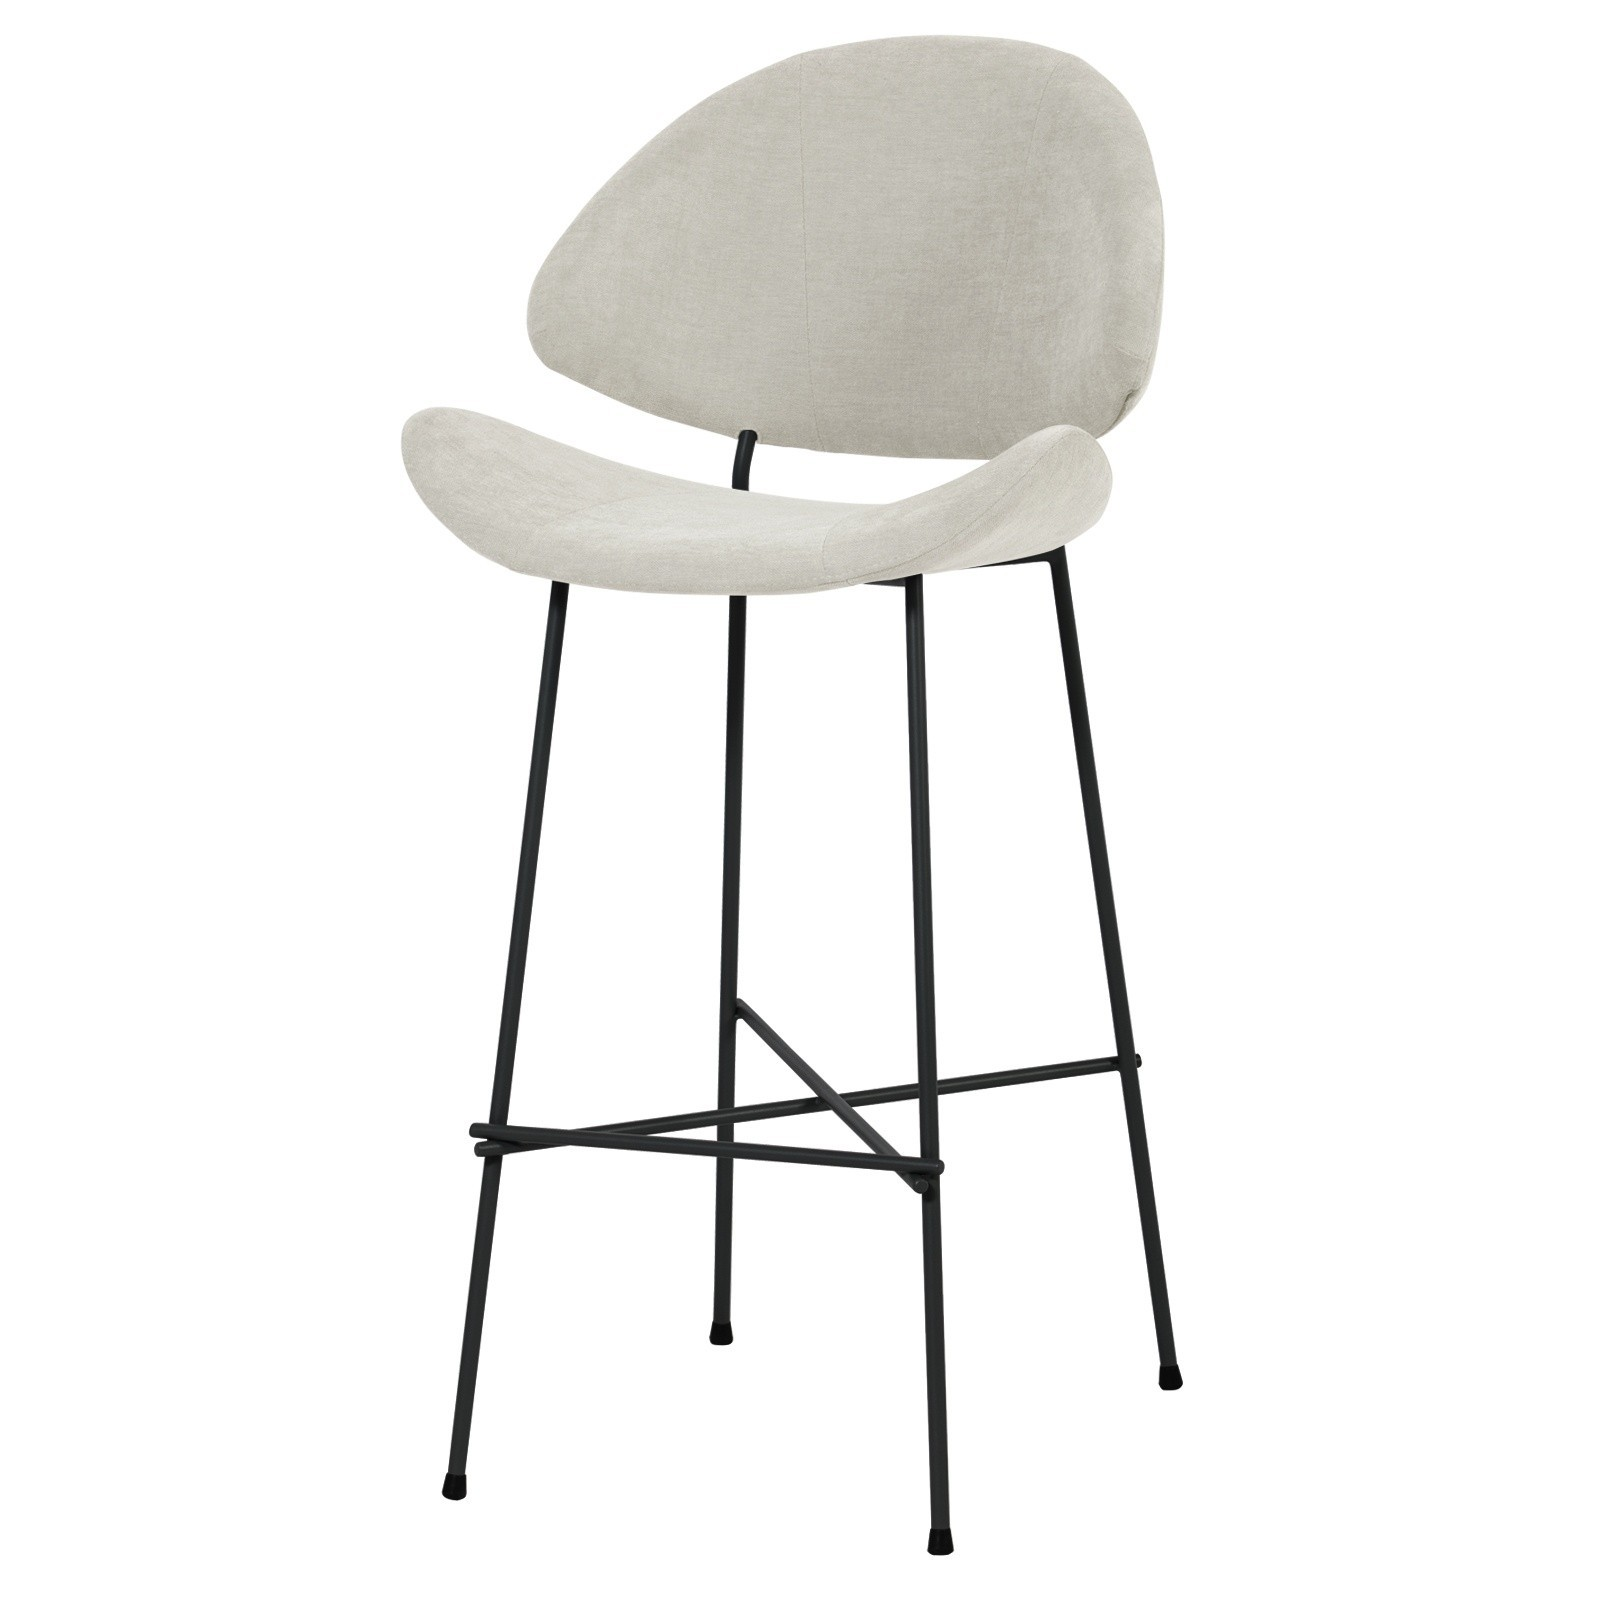 Krzesło barowe Cheri Bar - trend - ecru